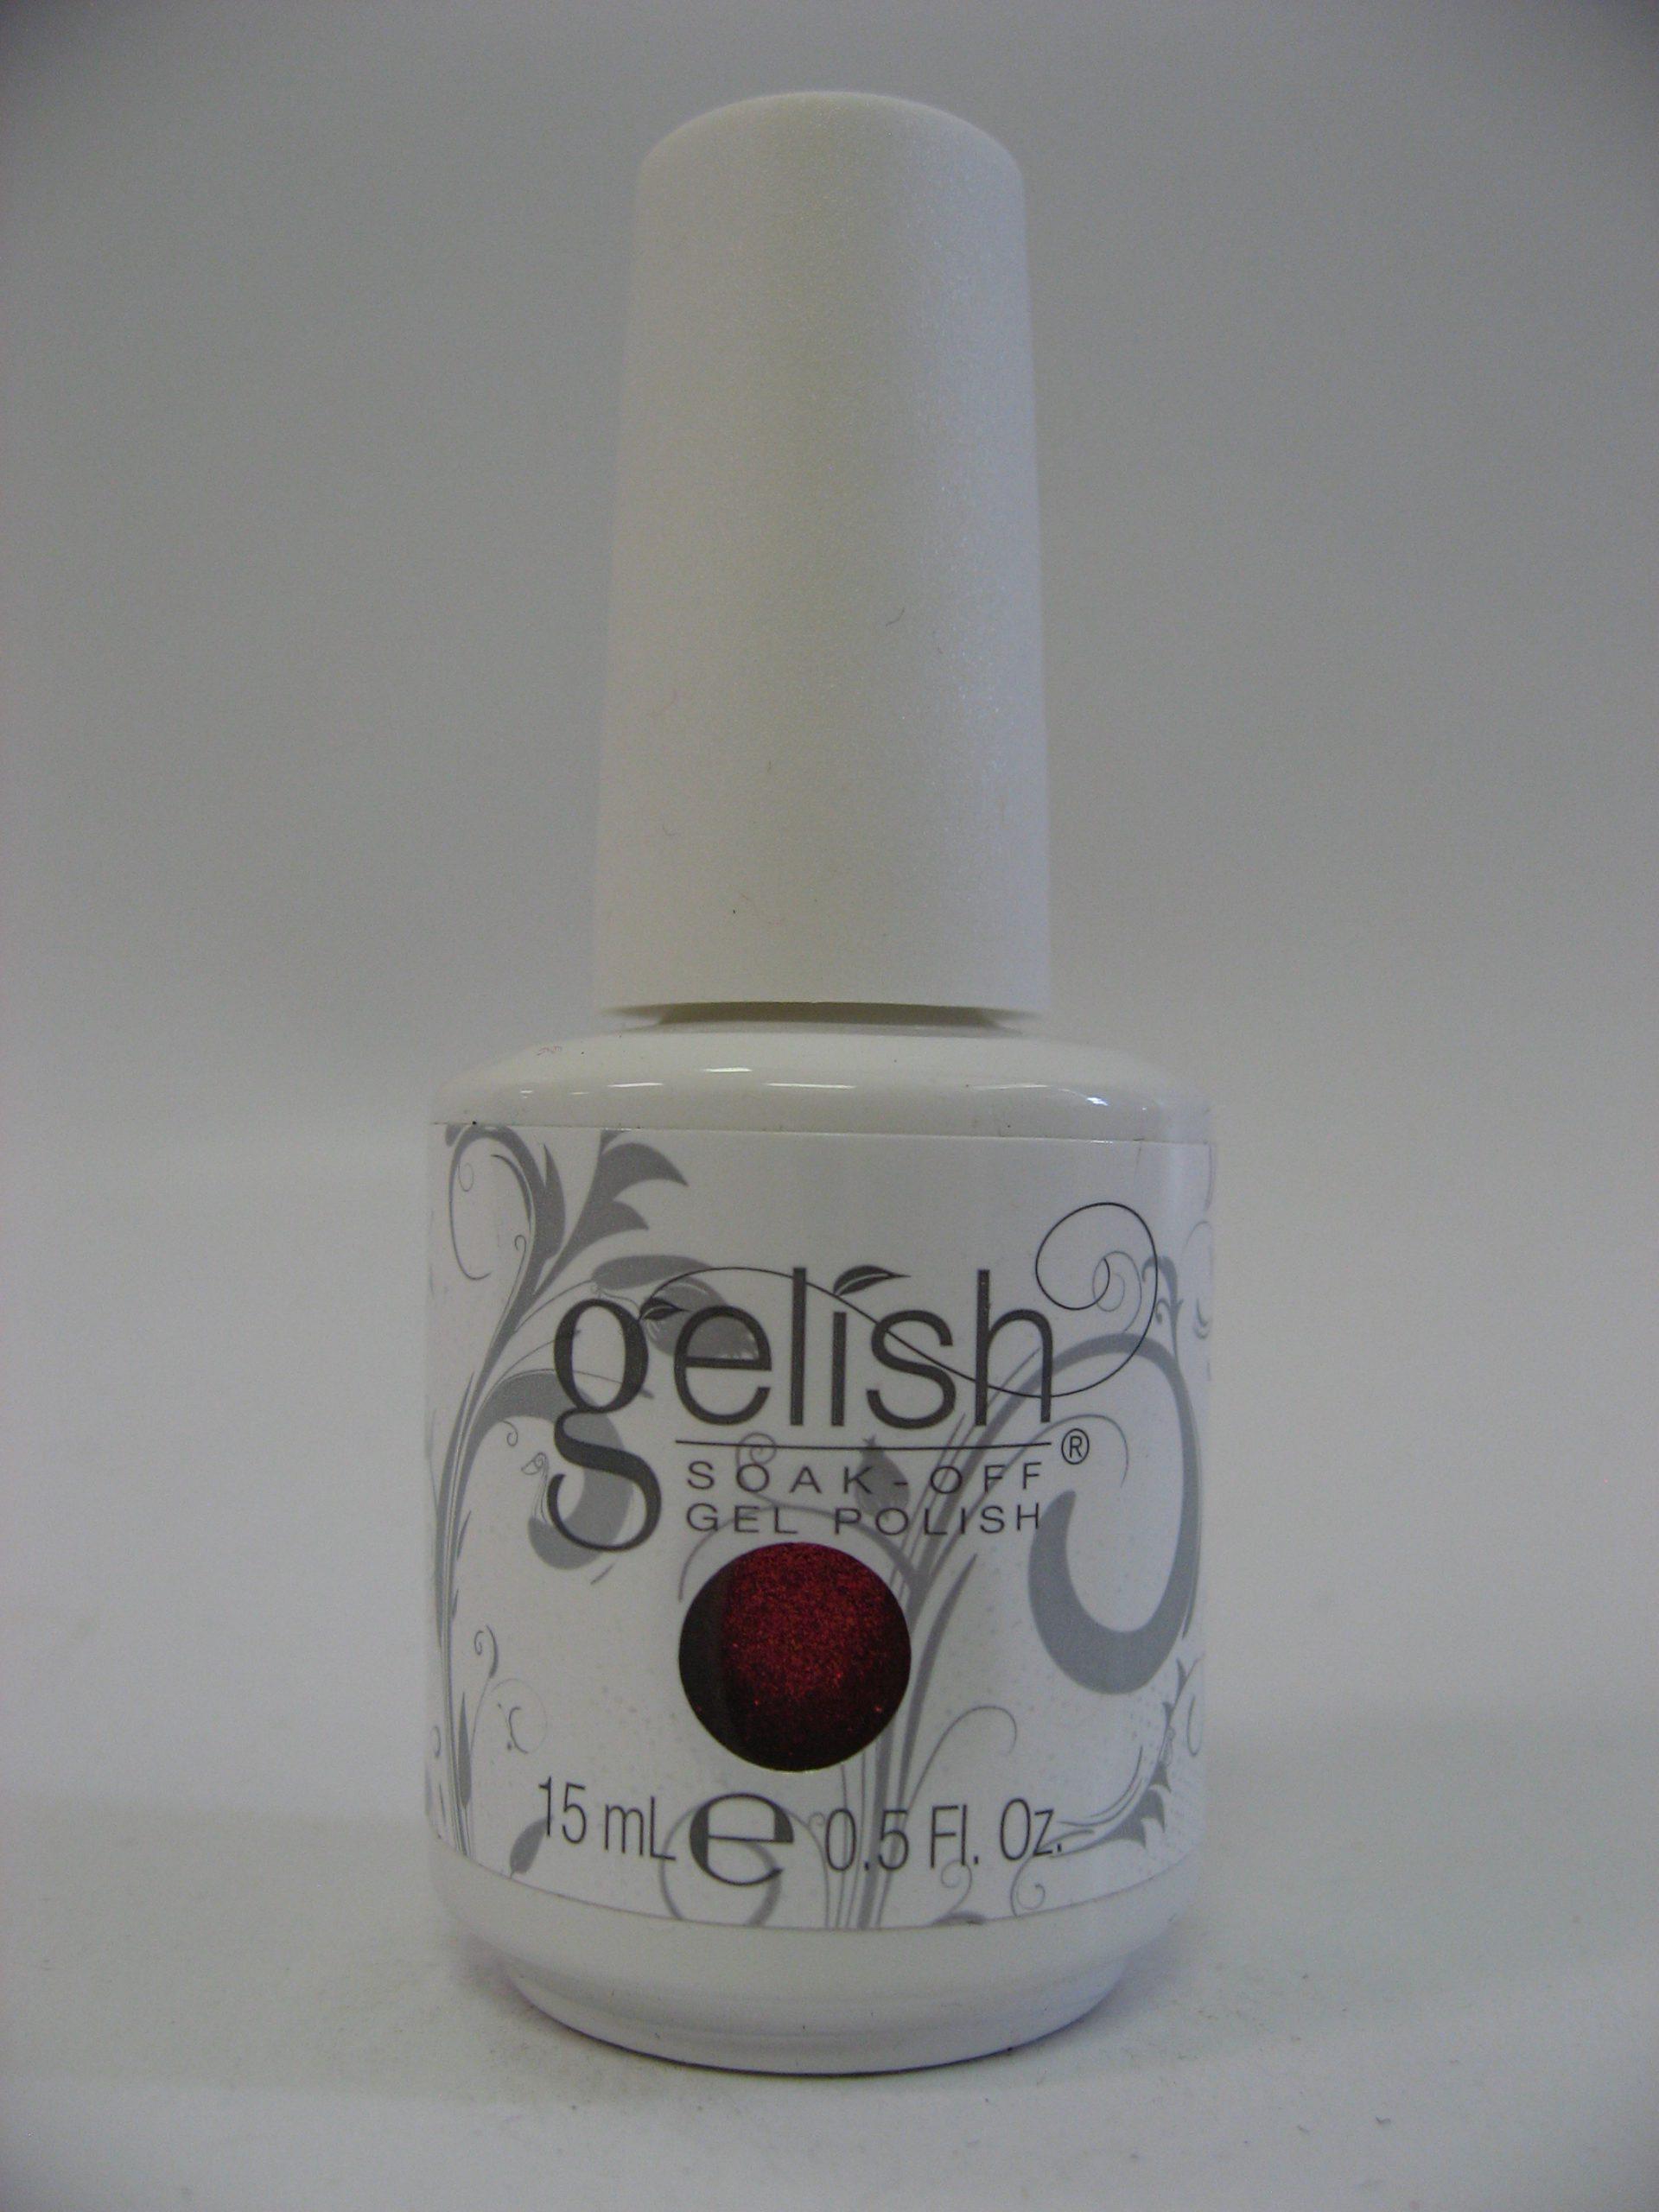 Gelish Soak Off Gel Polish - 1430 - Big City Siren